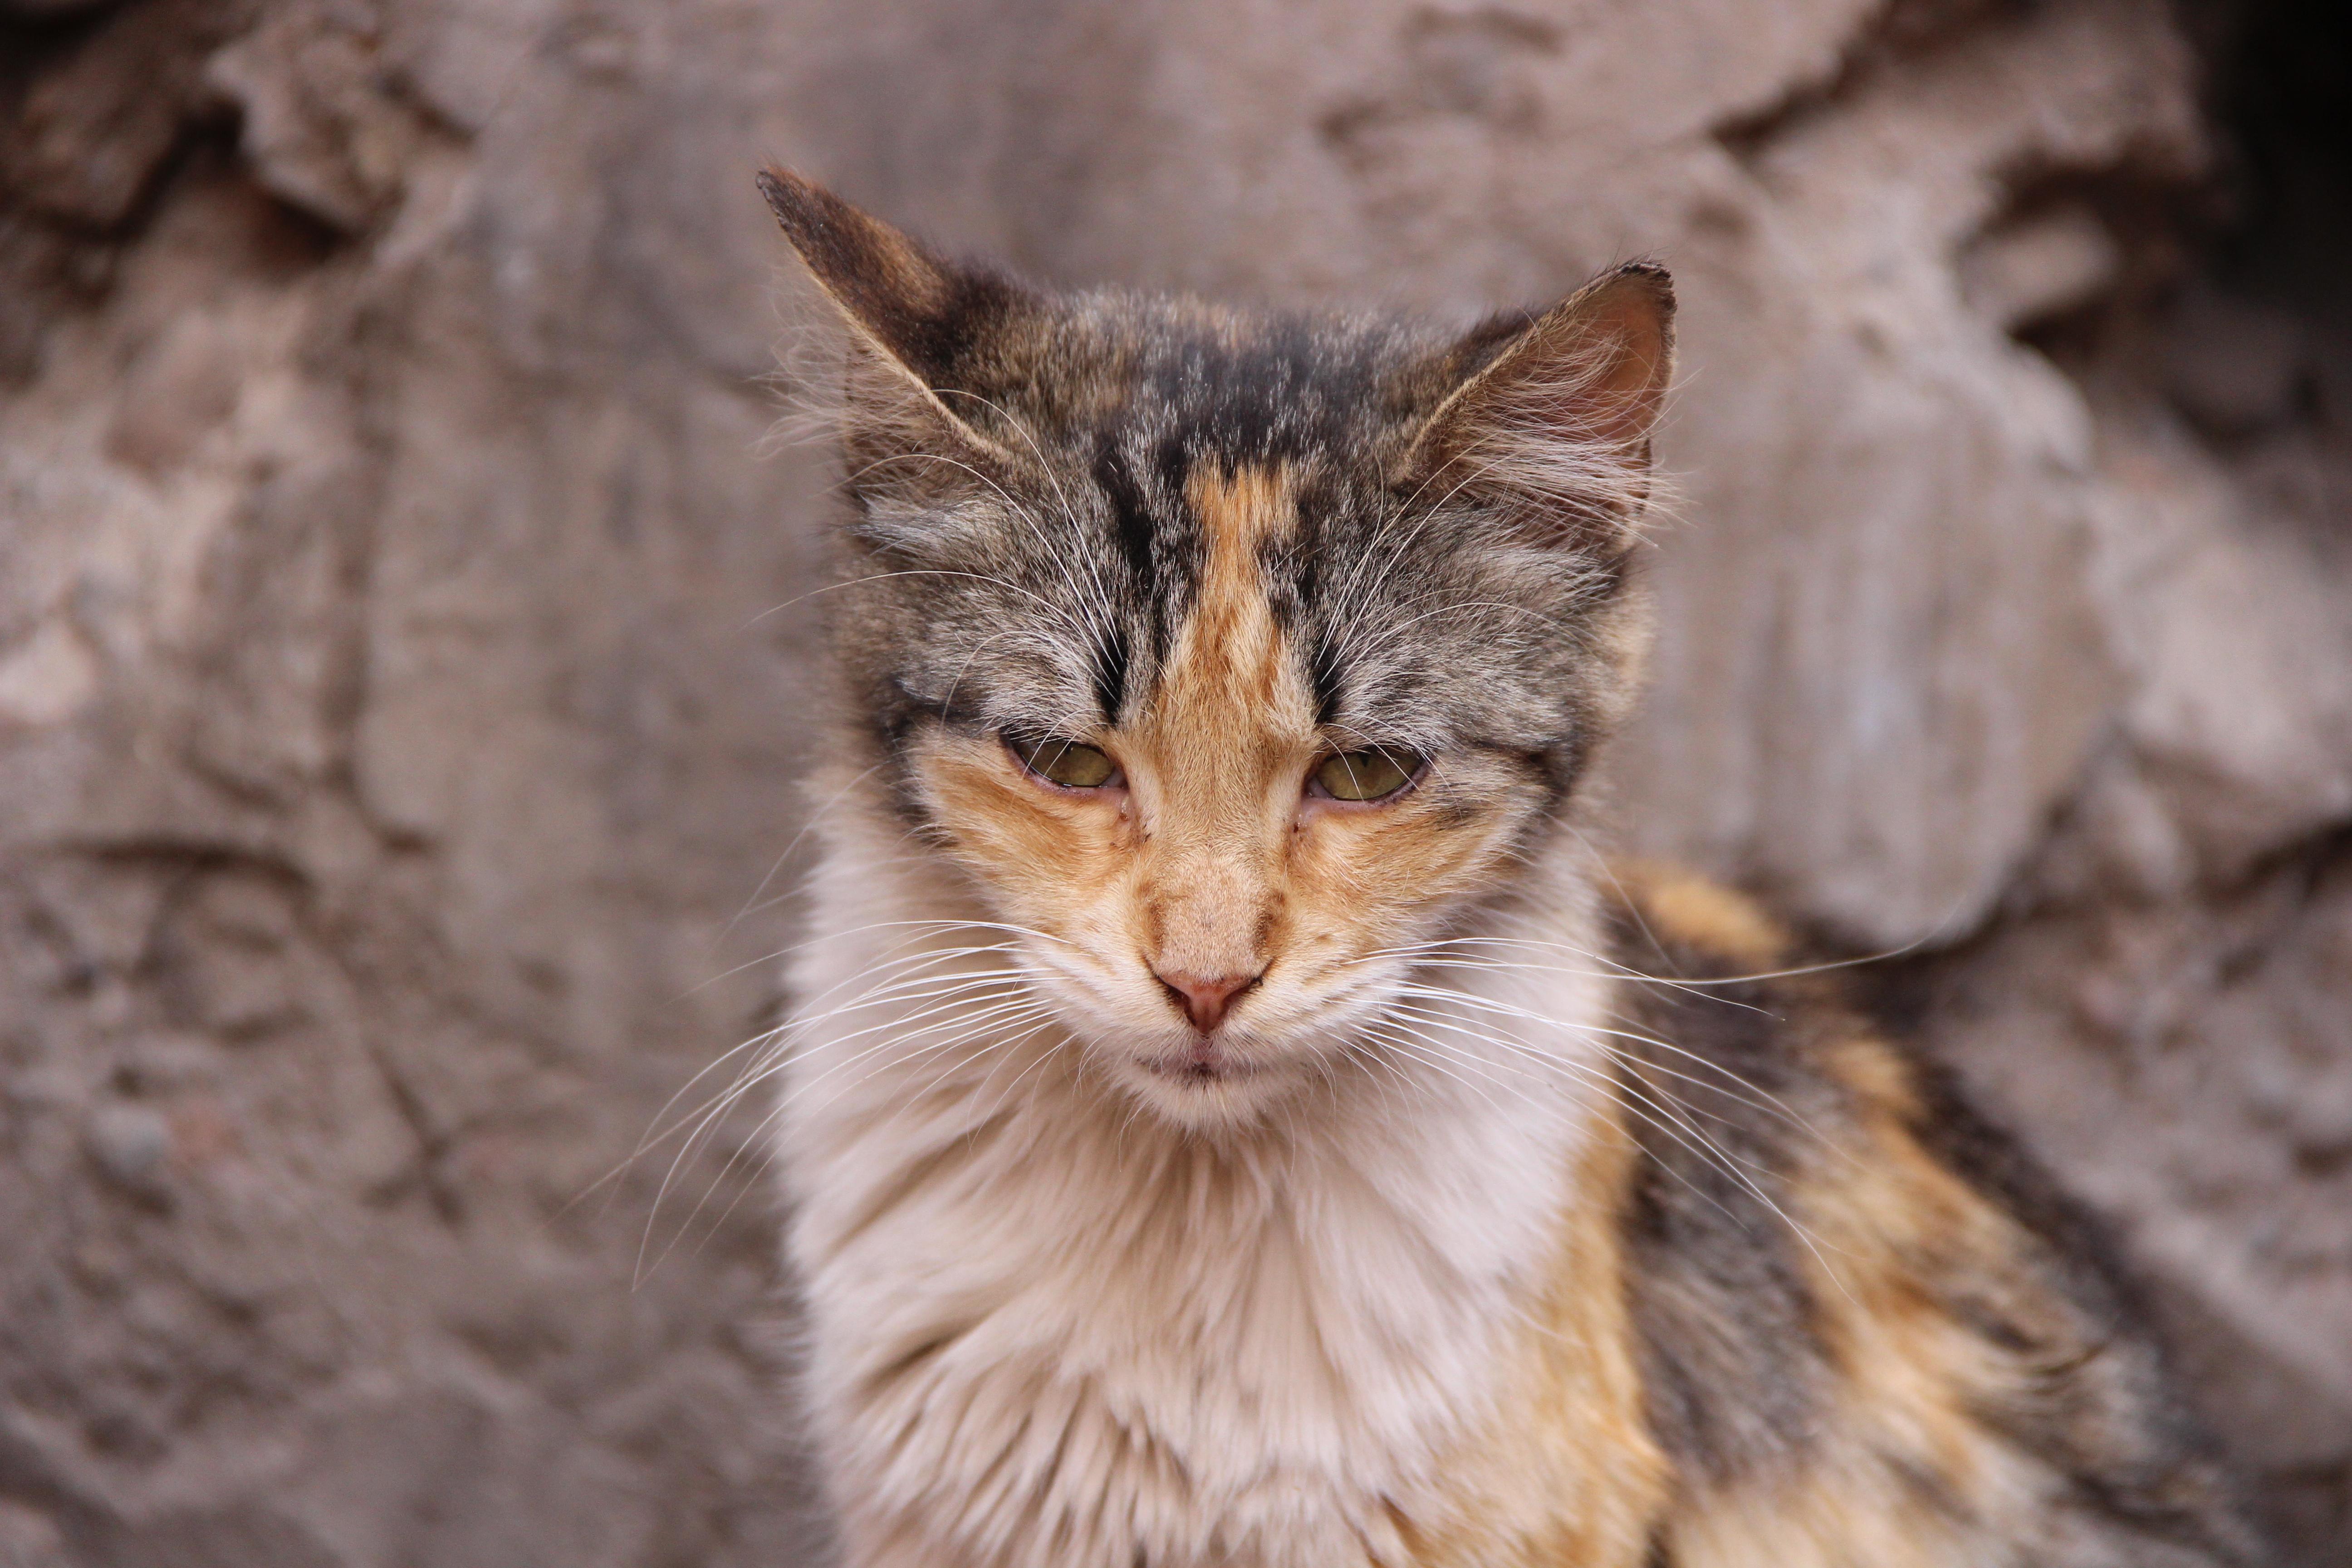 CAMILLE MORENOS - Chat des ruelles, Animal, Cat, Outdoor, Pet, HQ Photo